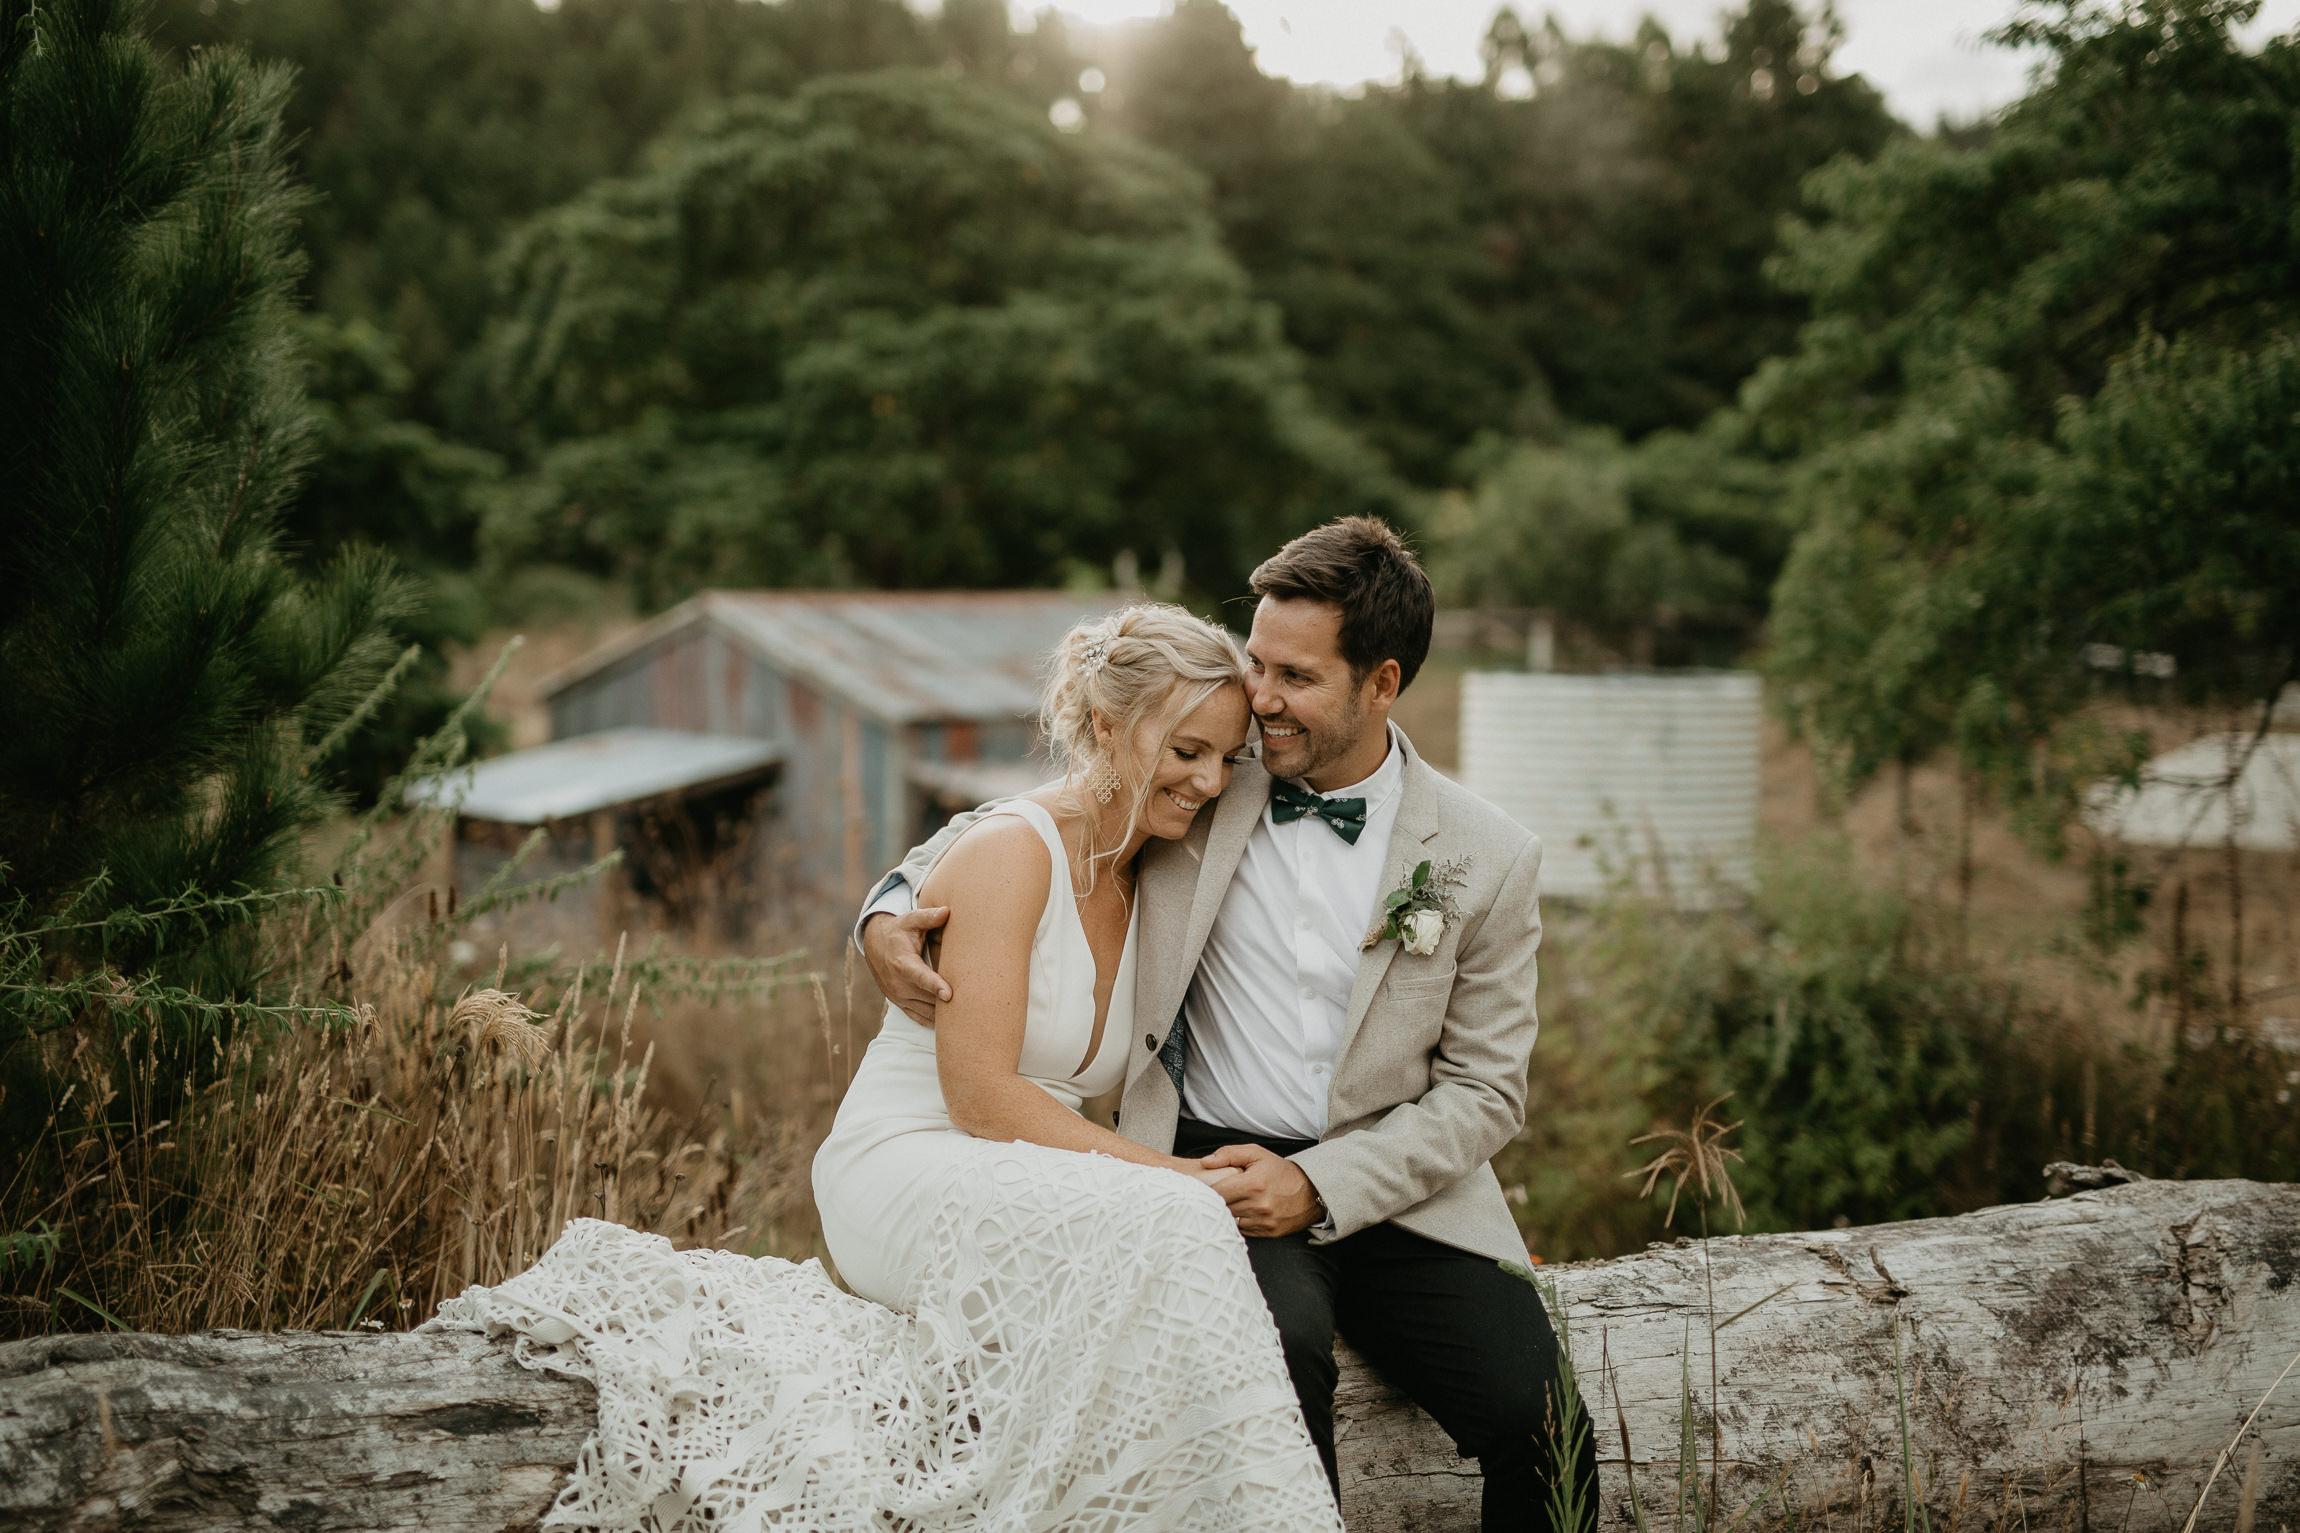 oldforestschool-wedding-blog-167.jpg